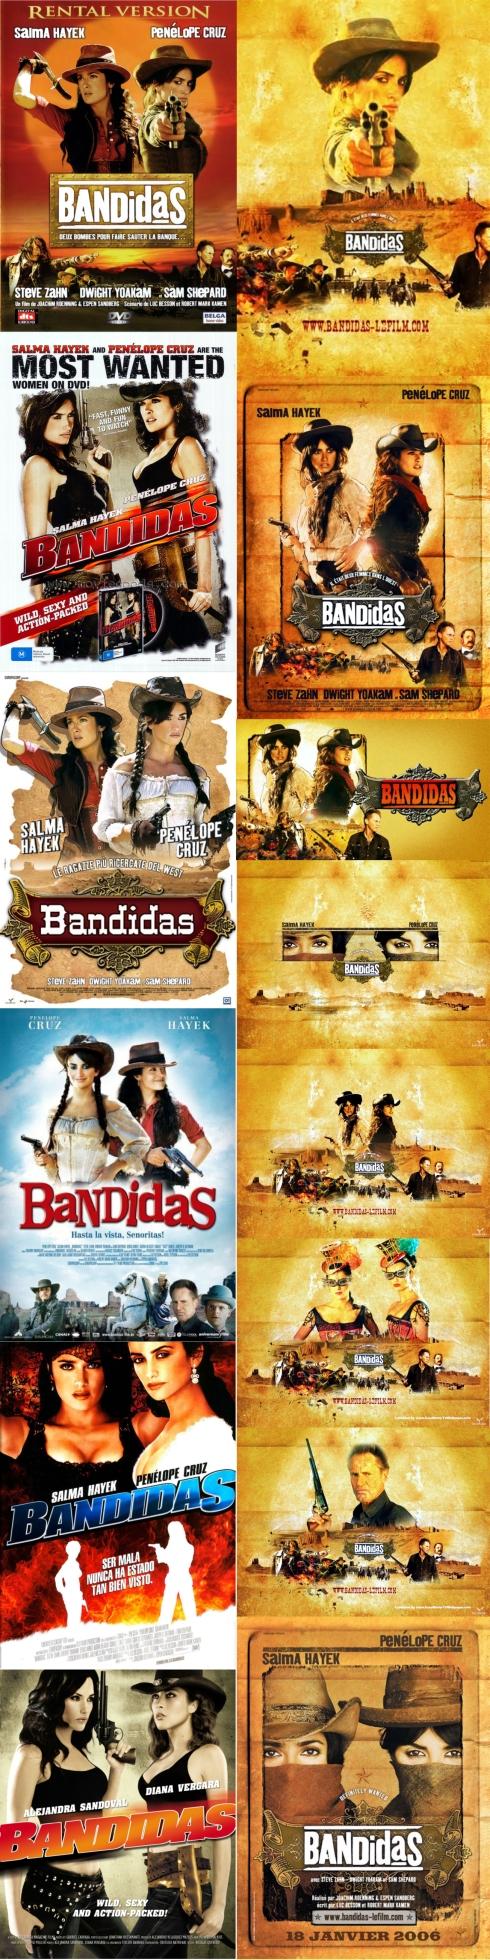 banditas posters